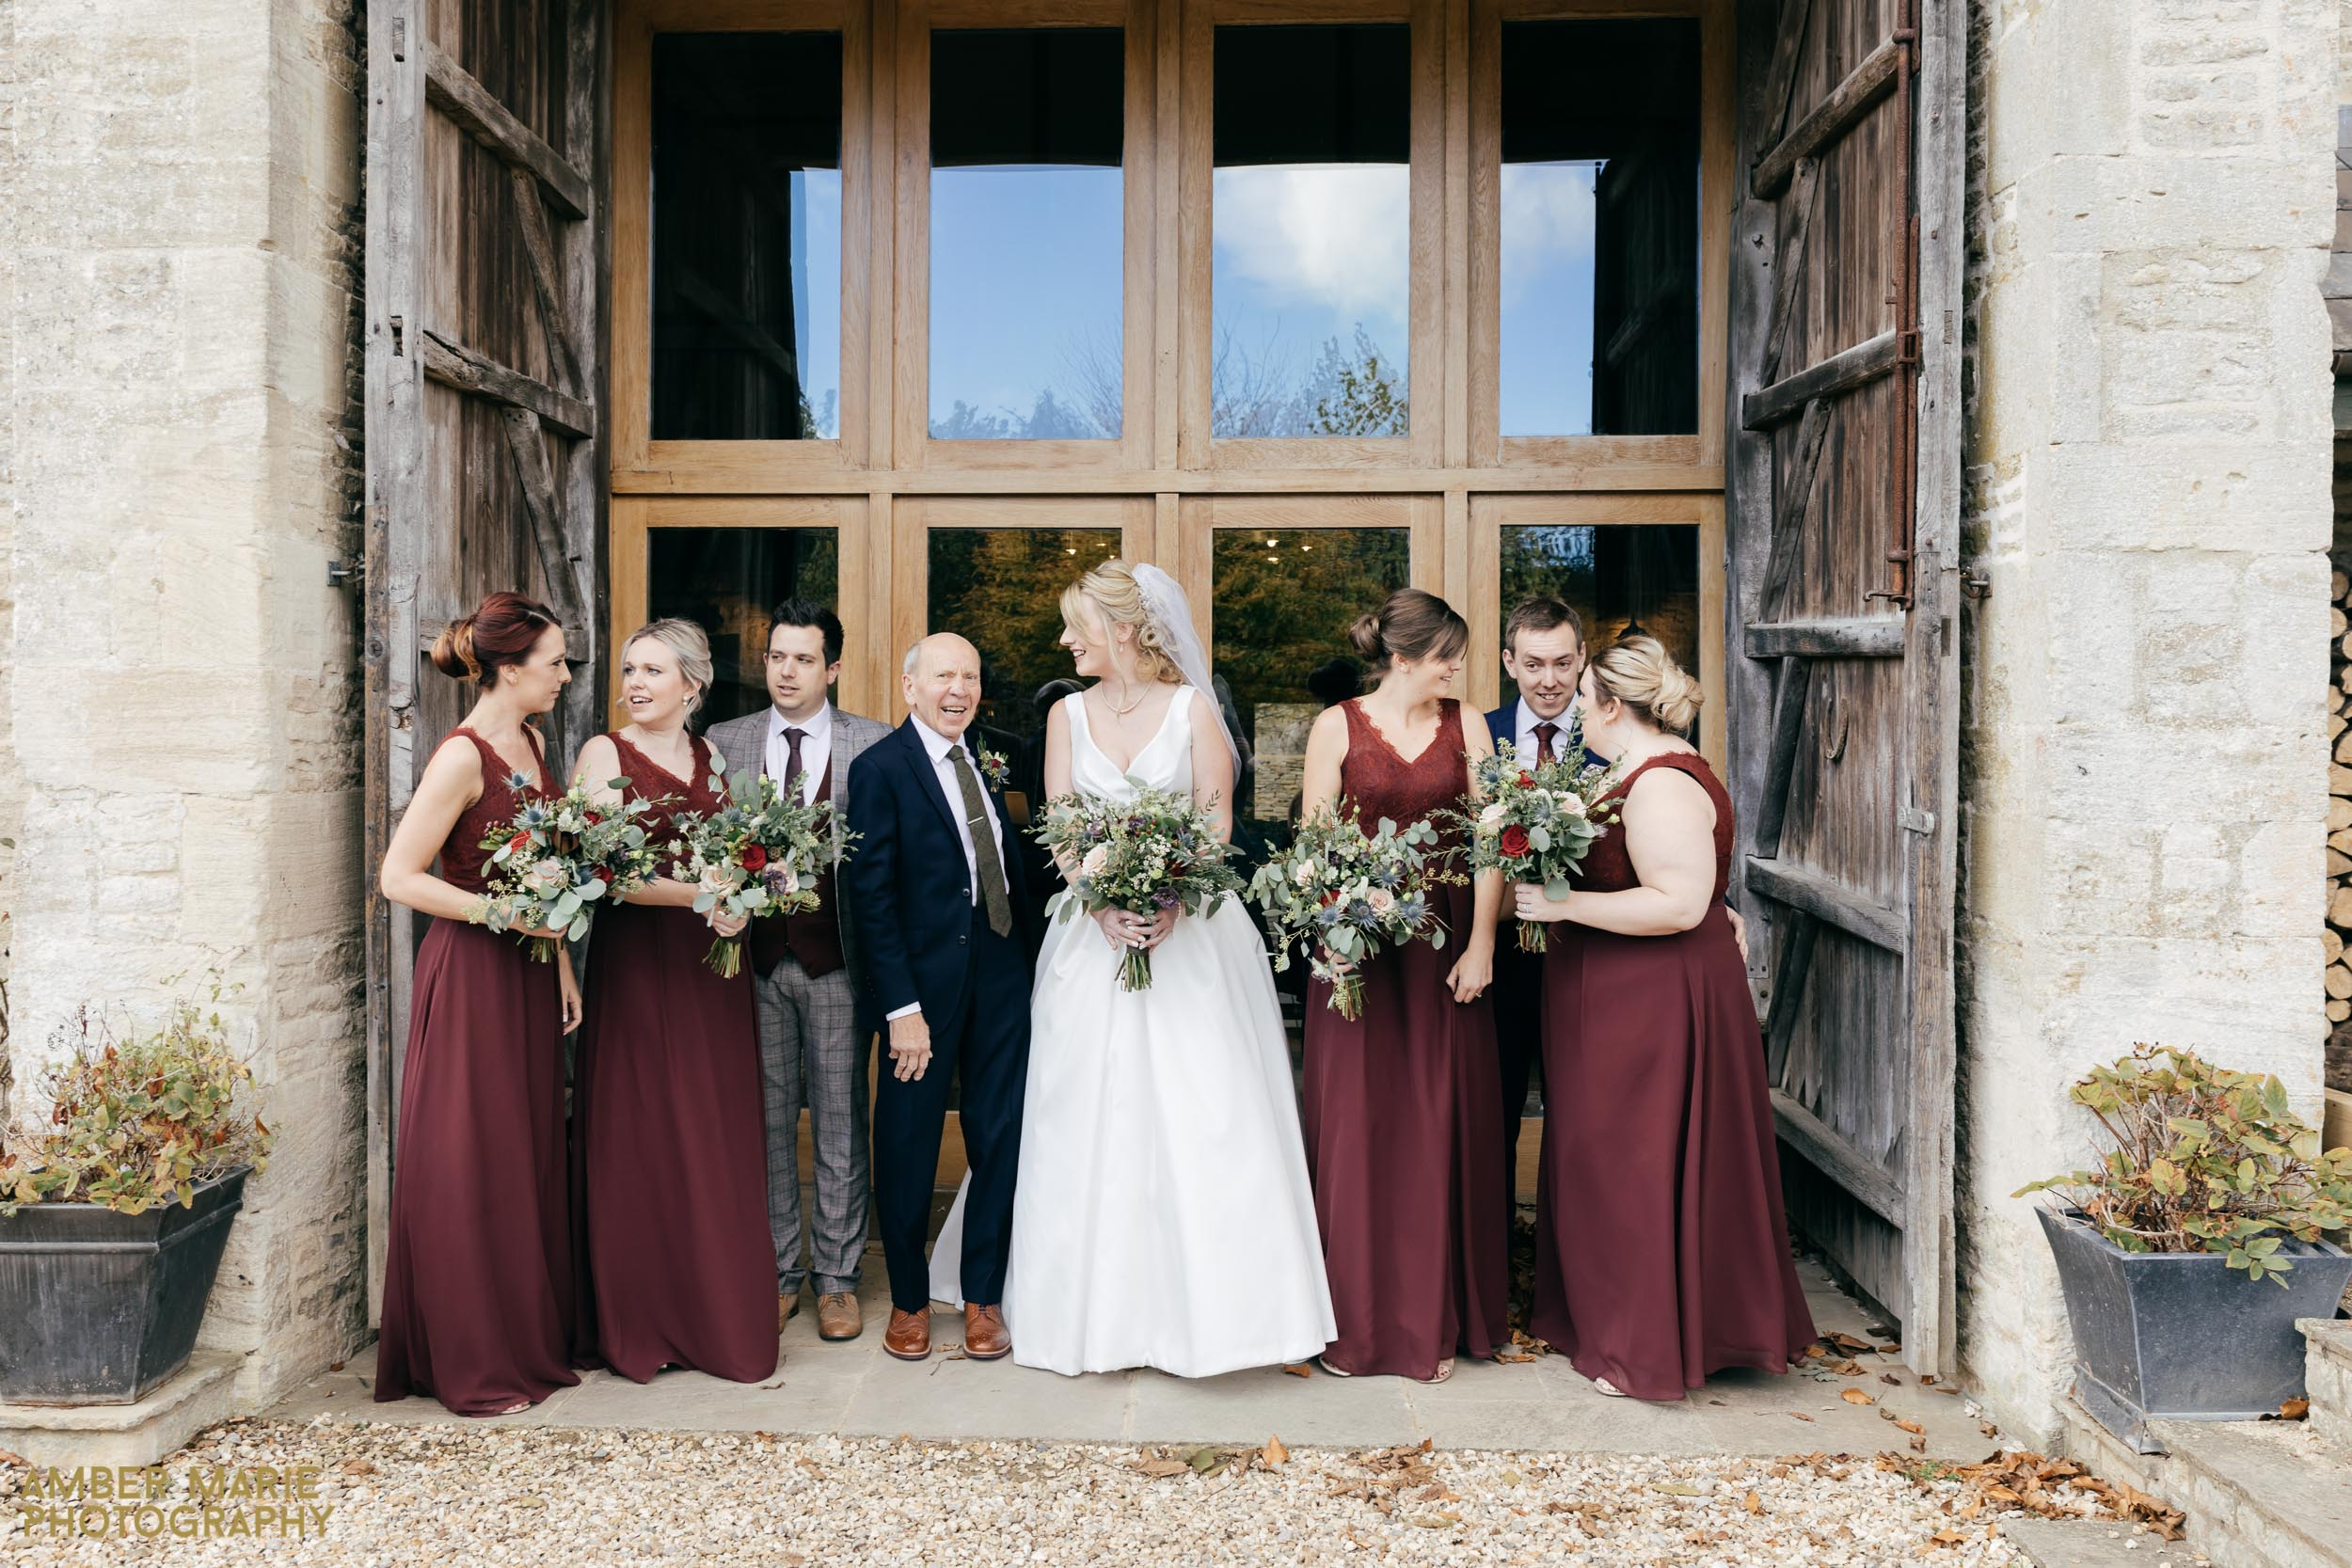 Stone Barn Wedding Wedding by Creative wedding photographer gloucestershire